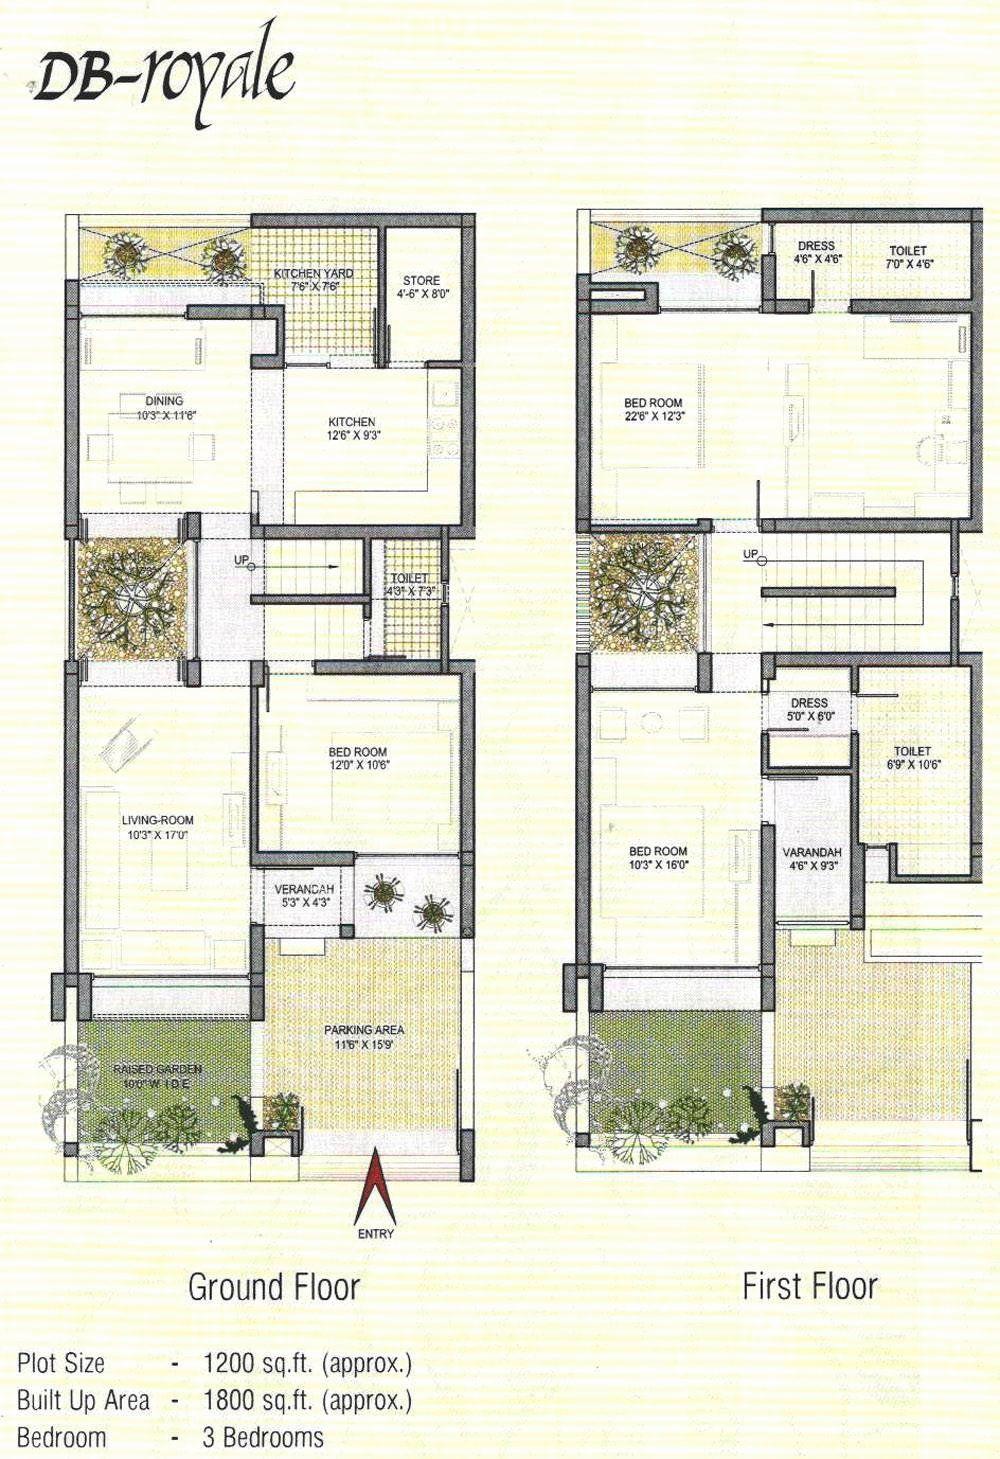 Contemporary Duplex House Plans Beautiful 54 Fresh Duplex House Designs 1200 Sq Ft Stock Daftar In 2020 Indian House Plans Duplex House Plans Modern House Plans